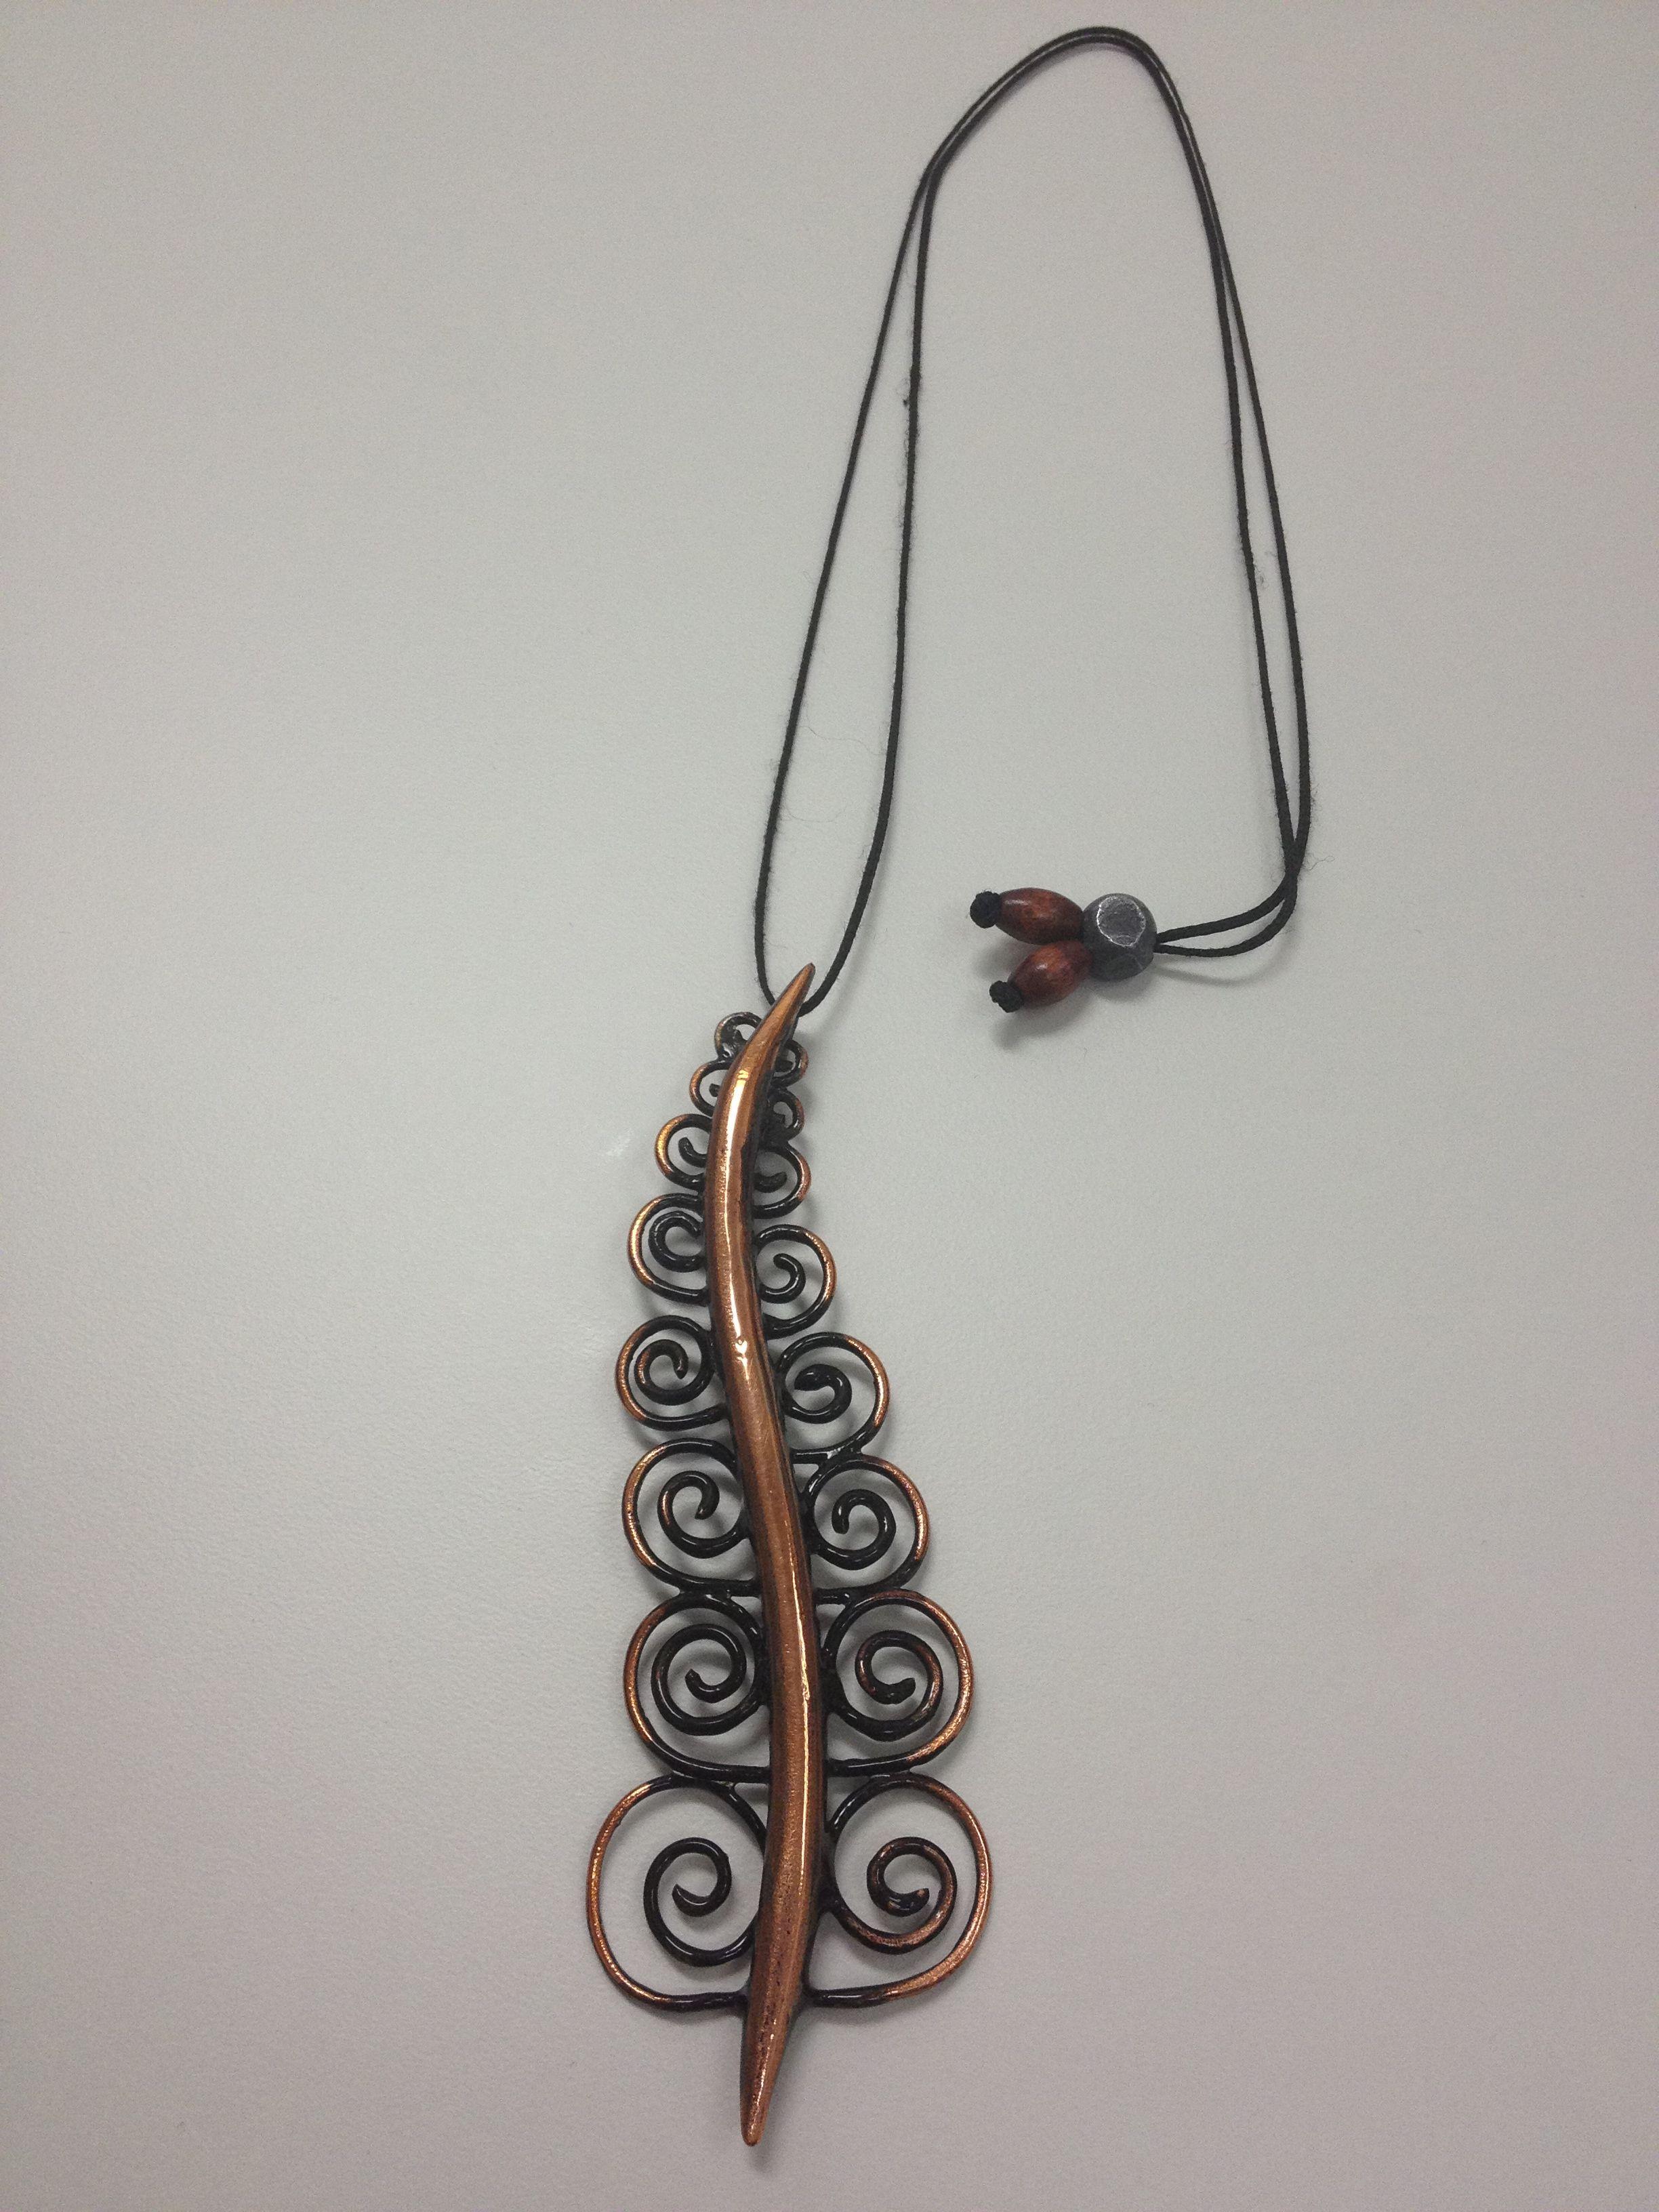 Artache jewelry design in New Zealand. Maori design made from burnt ...